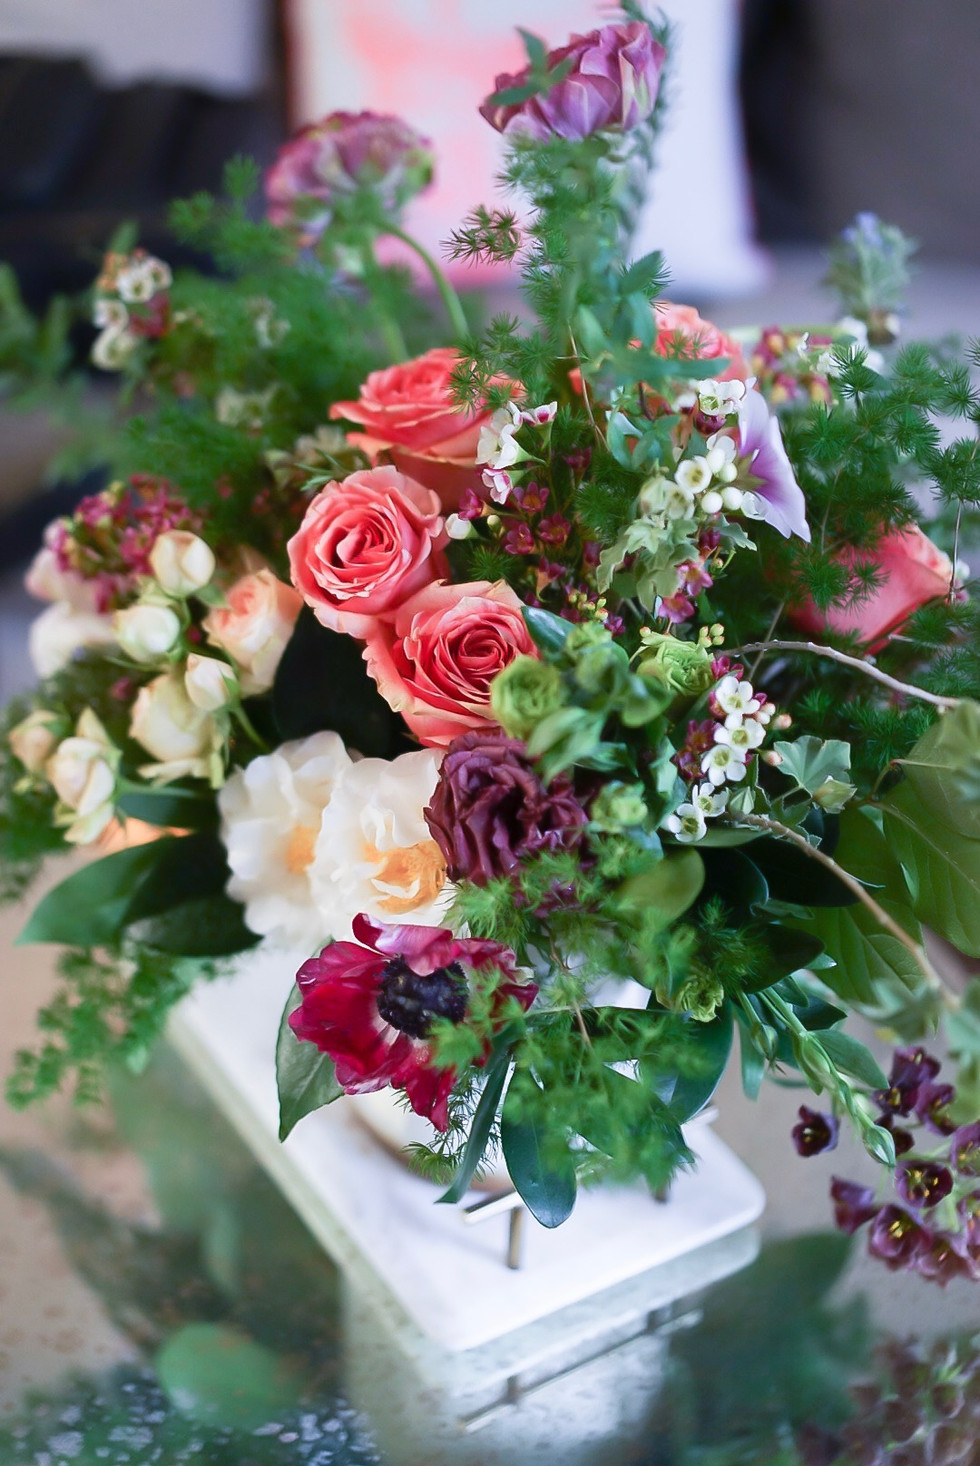 Santa Clarita Mother's Day Florist